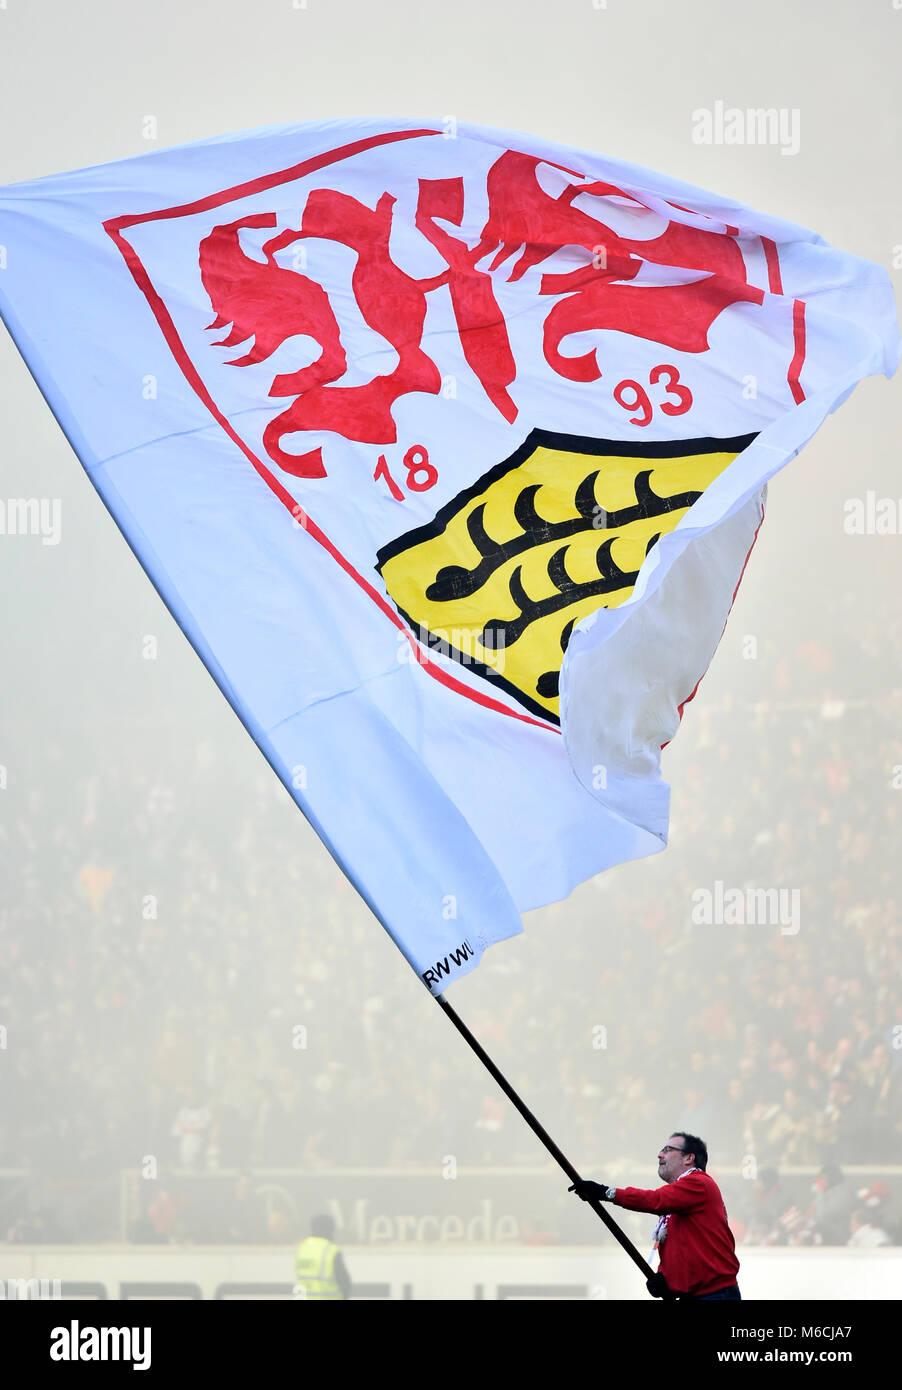 Employee with flag logo VfB Stuttgart, Mercedes-Benz Arena, Stuttgart, Baden-Württemberg, Germany Stock Photo